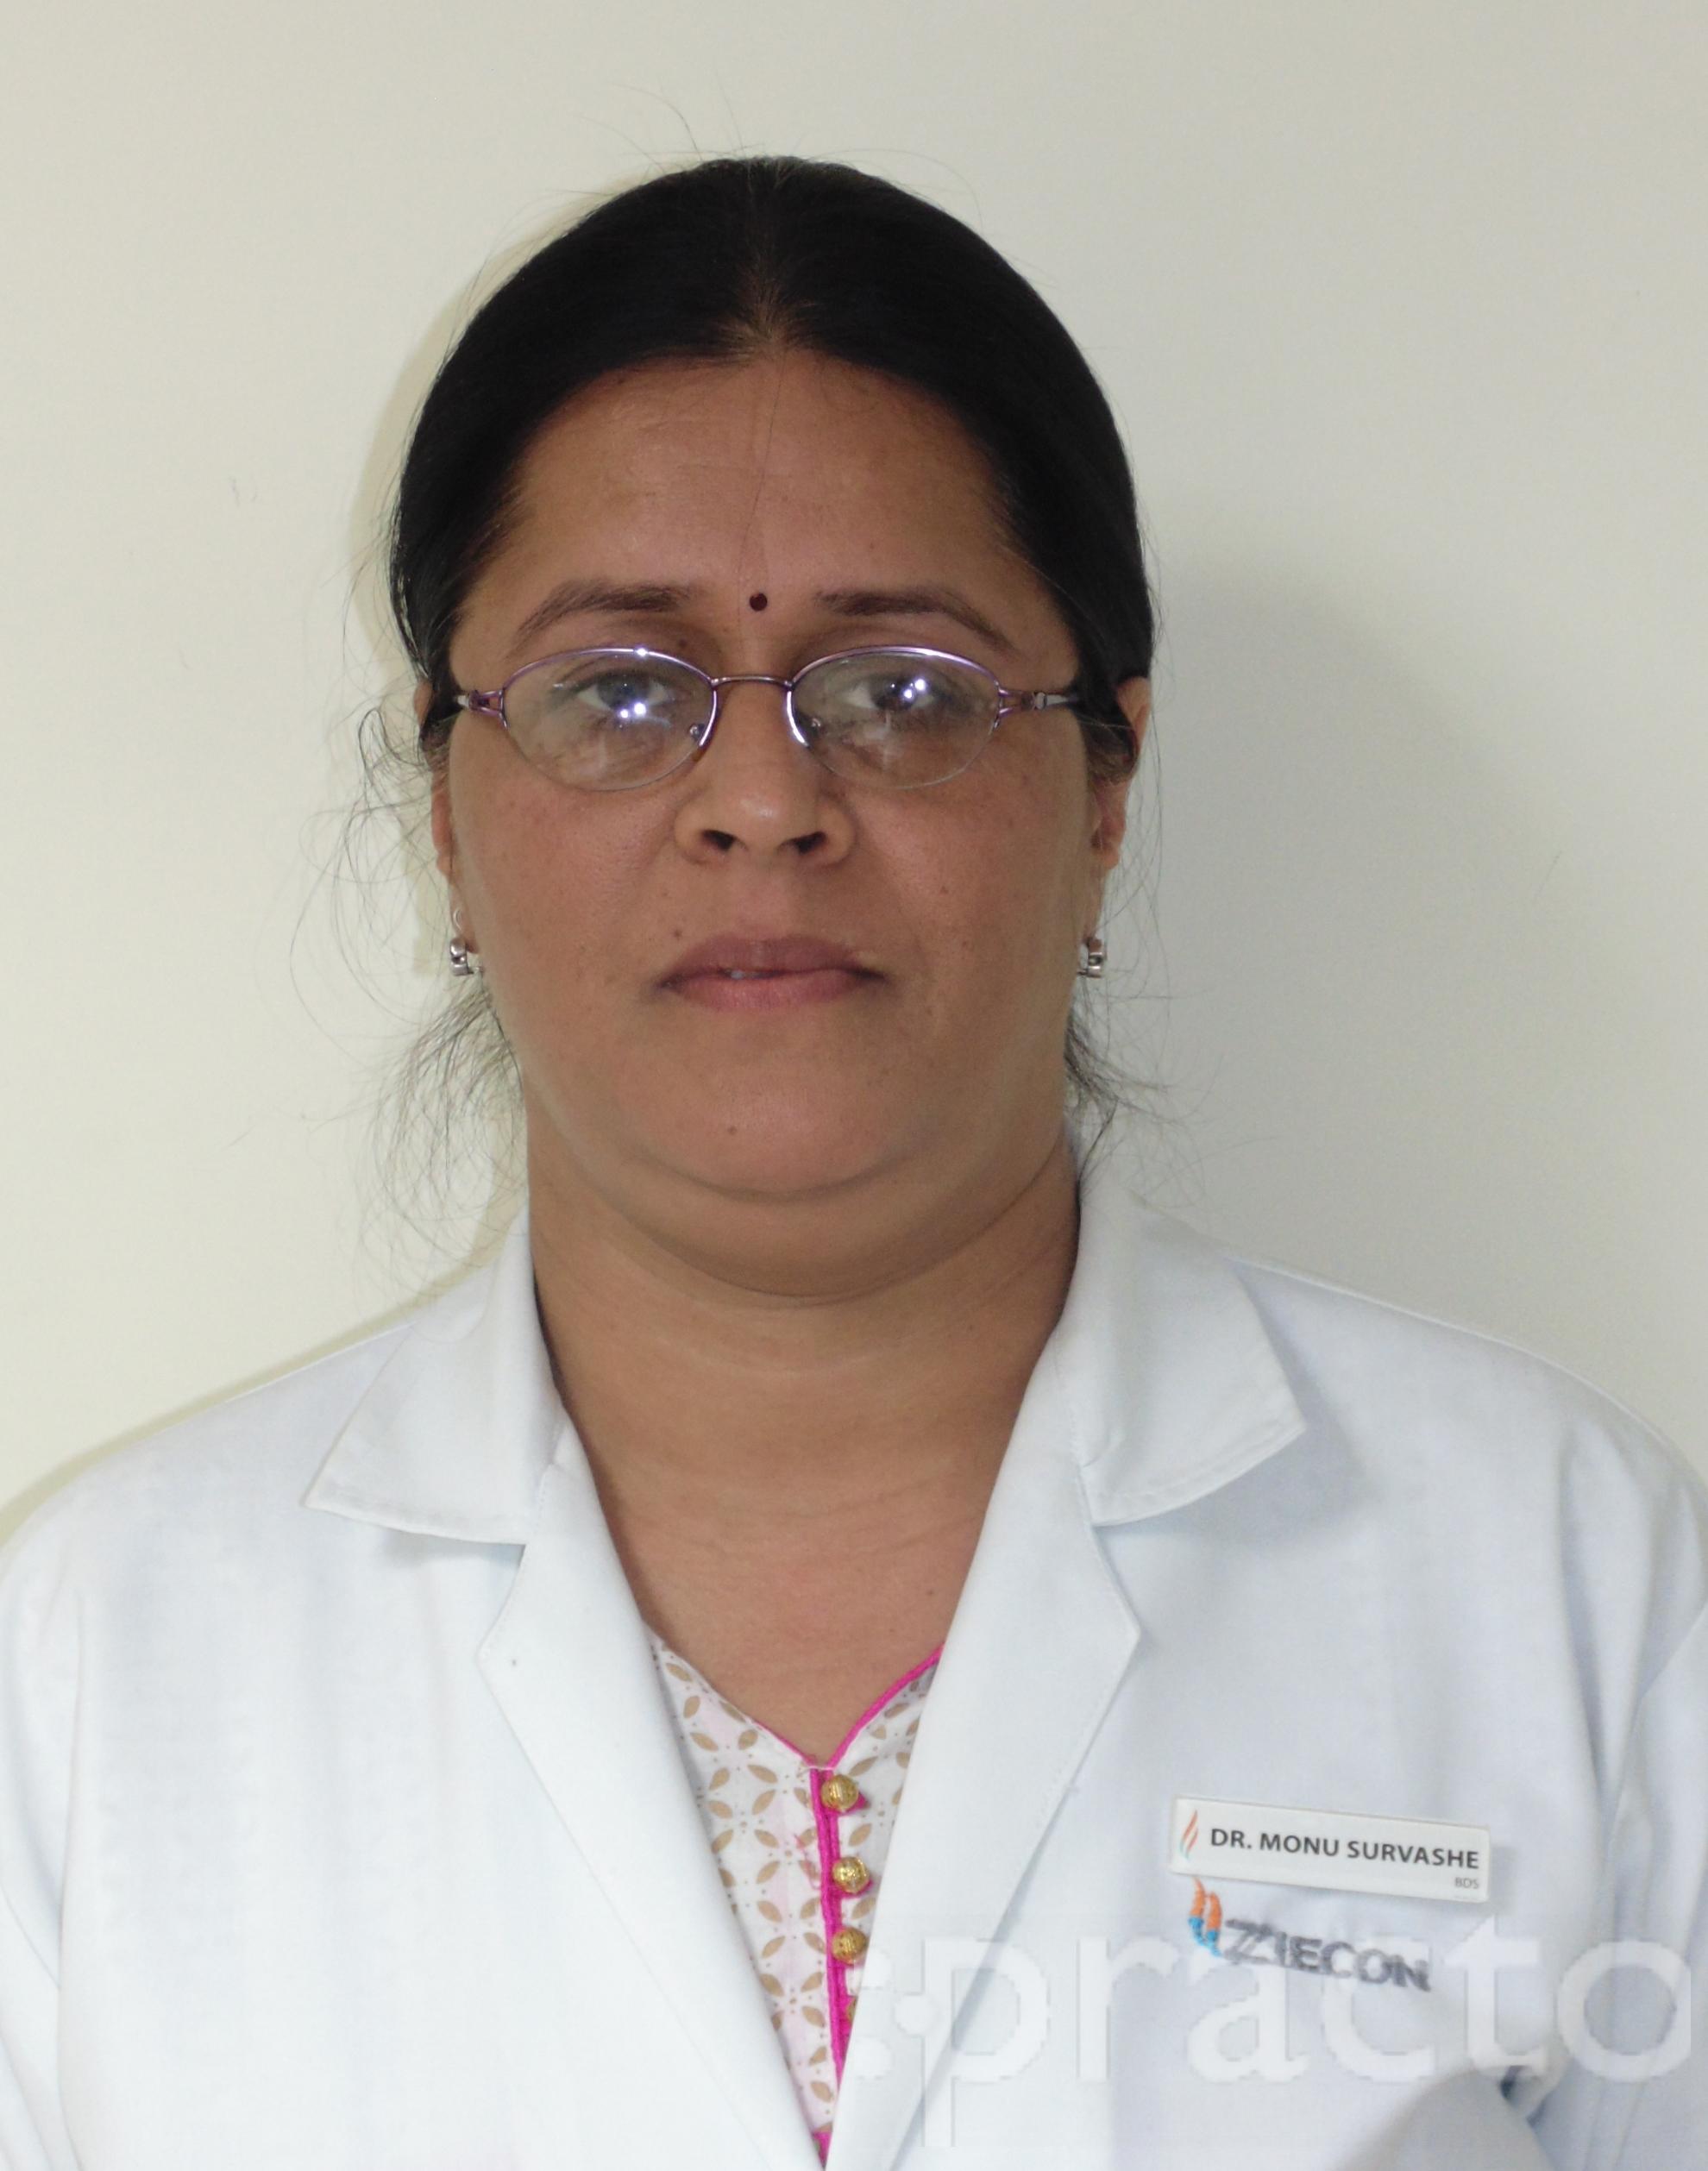 Dr. Monu Survashe - Dentist